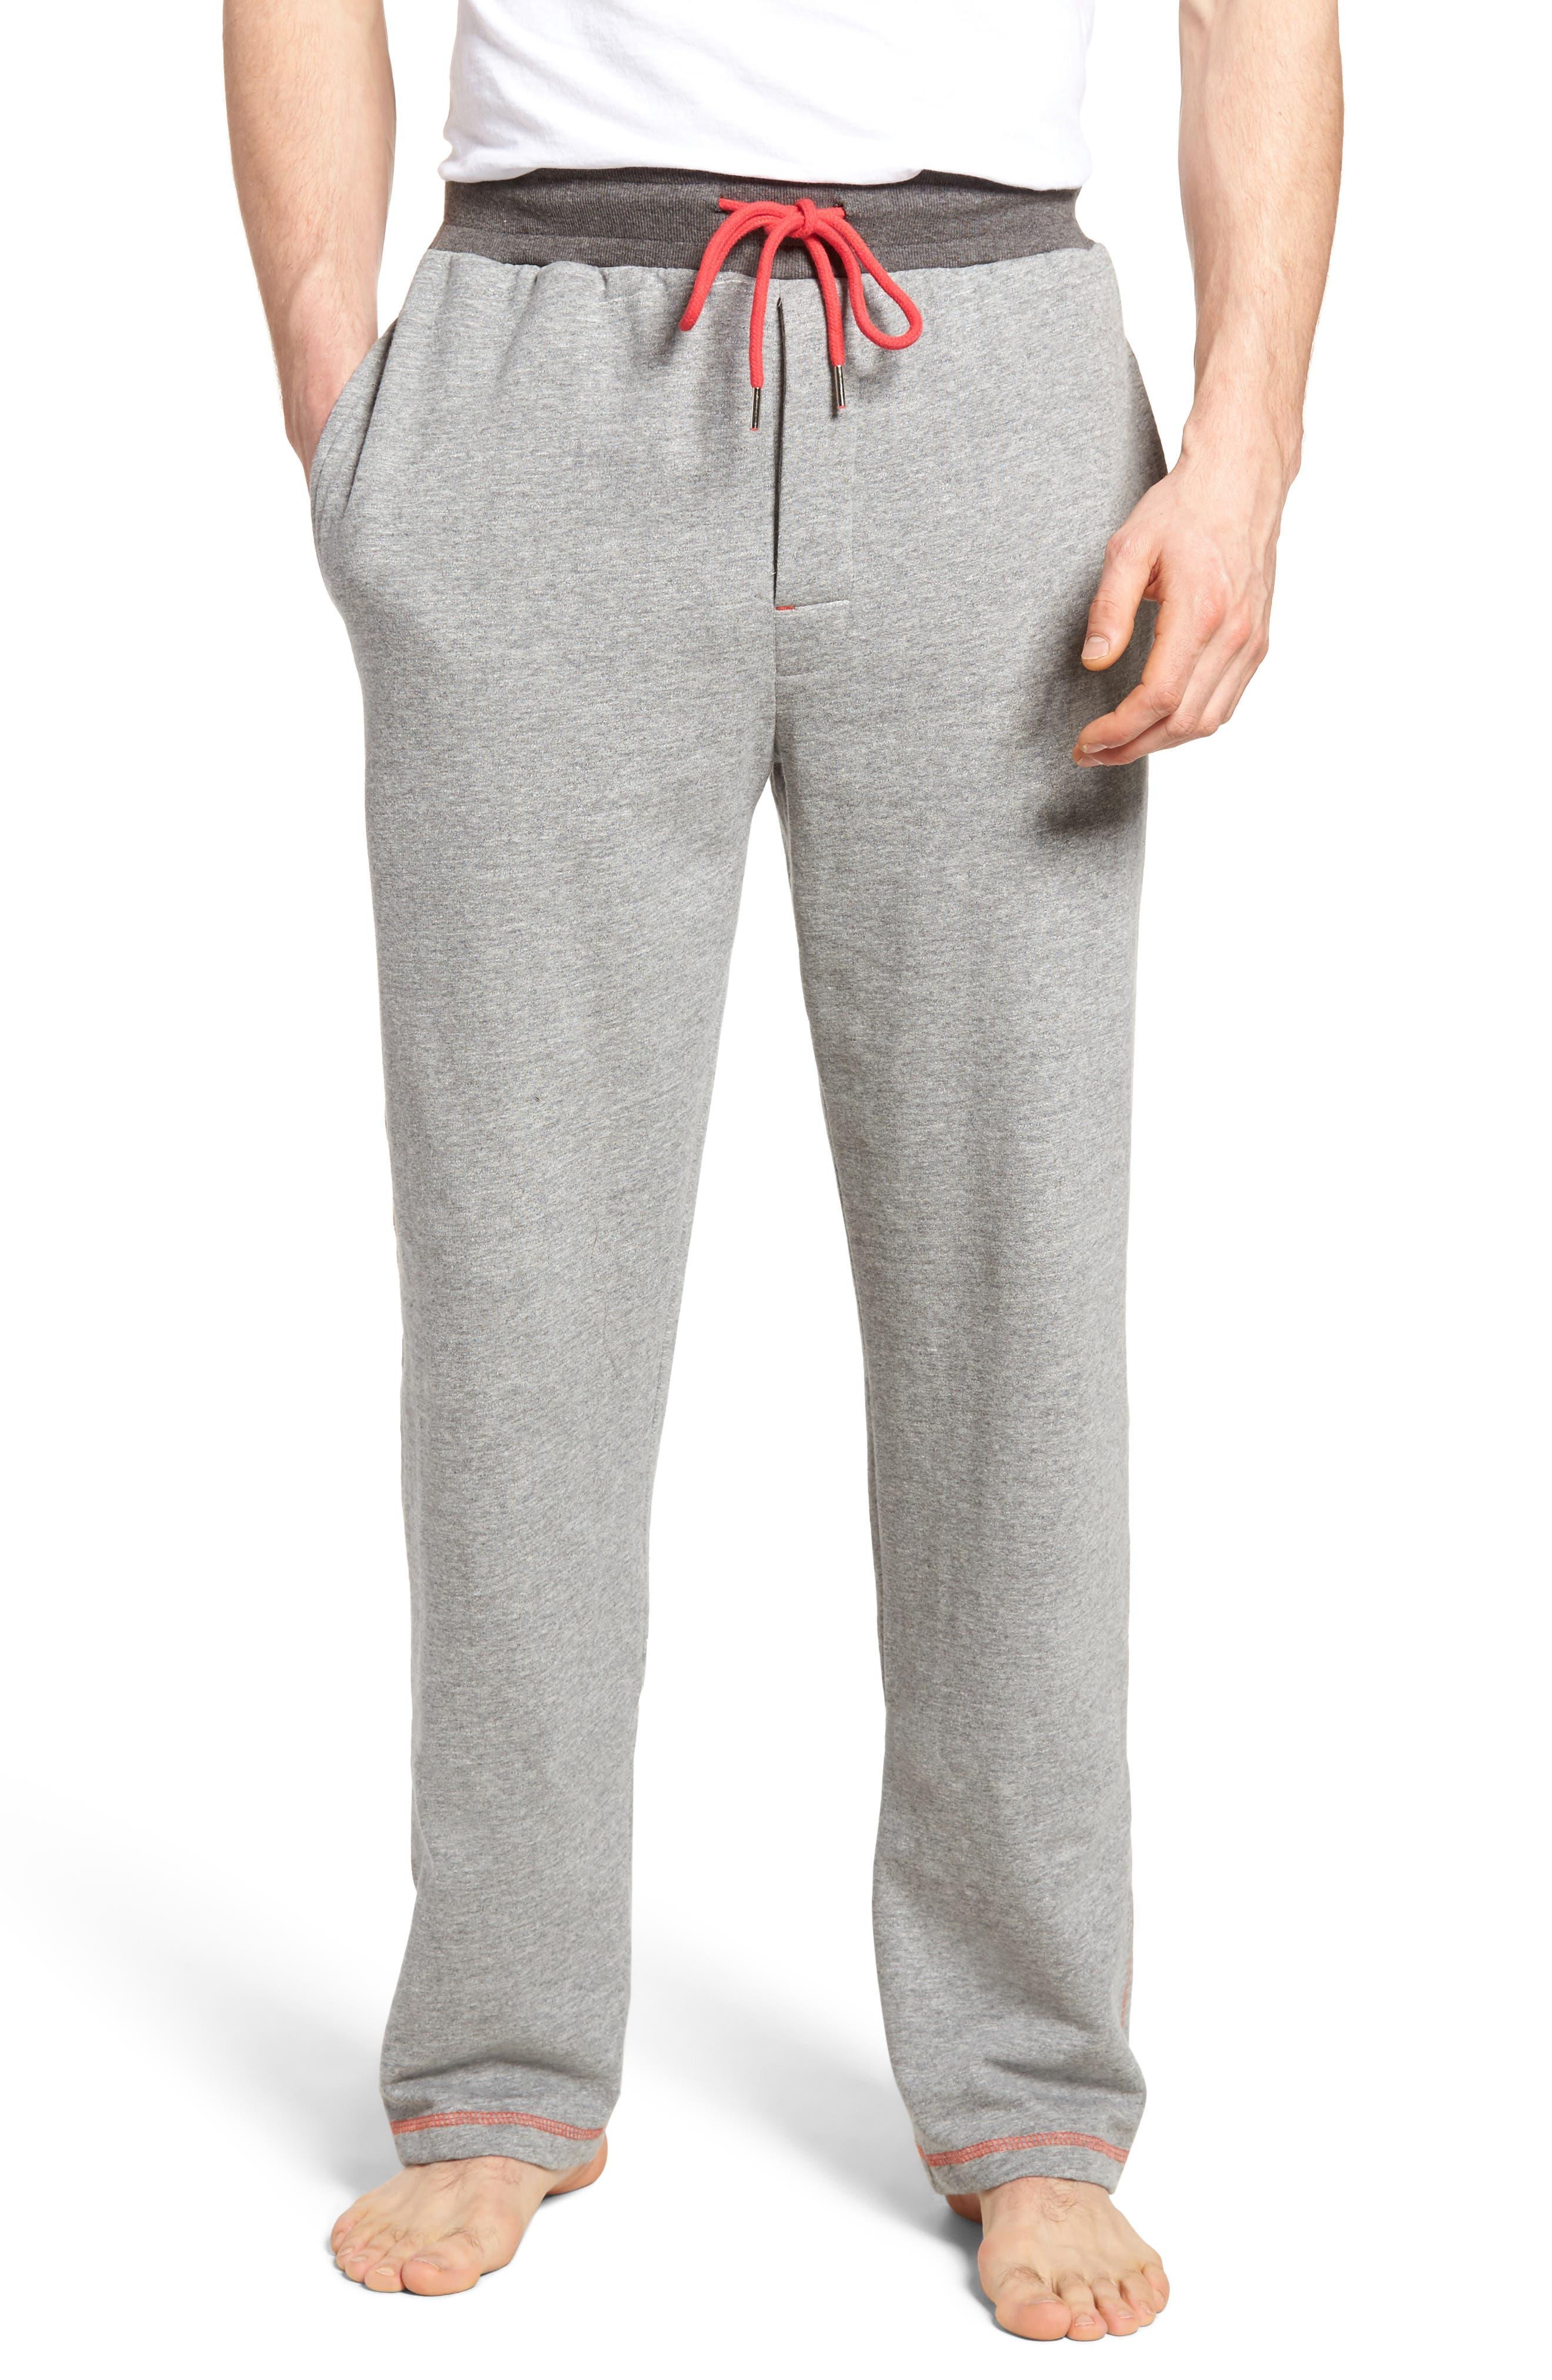 Bhooka Cotton Blend Lounge Pants,                         Main,                         color, 020